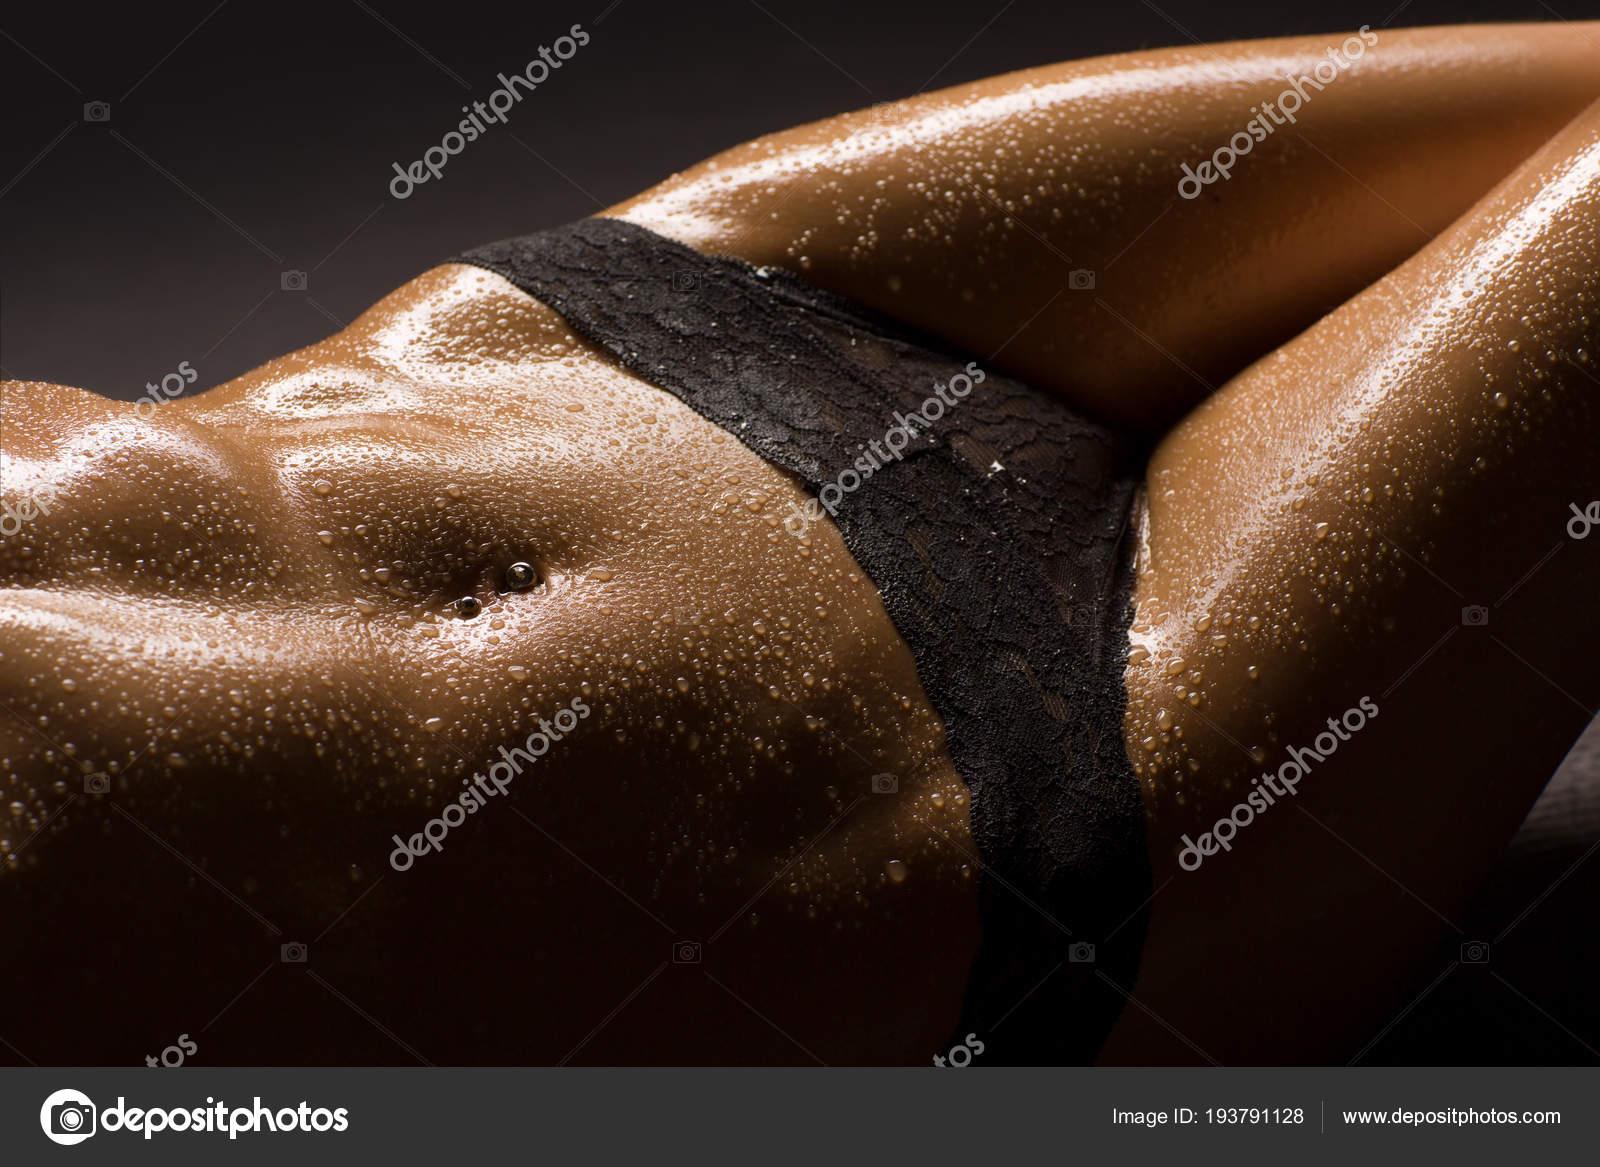 Ava addams shower gif